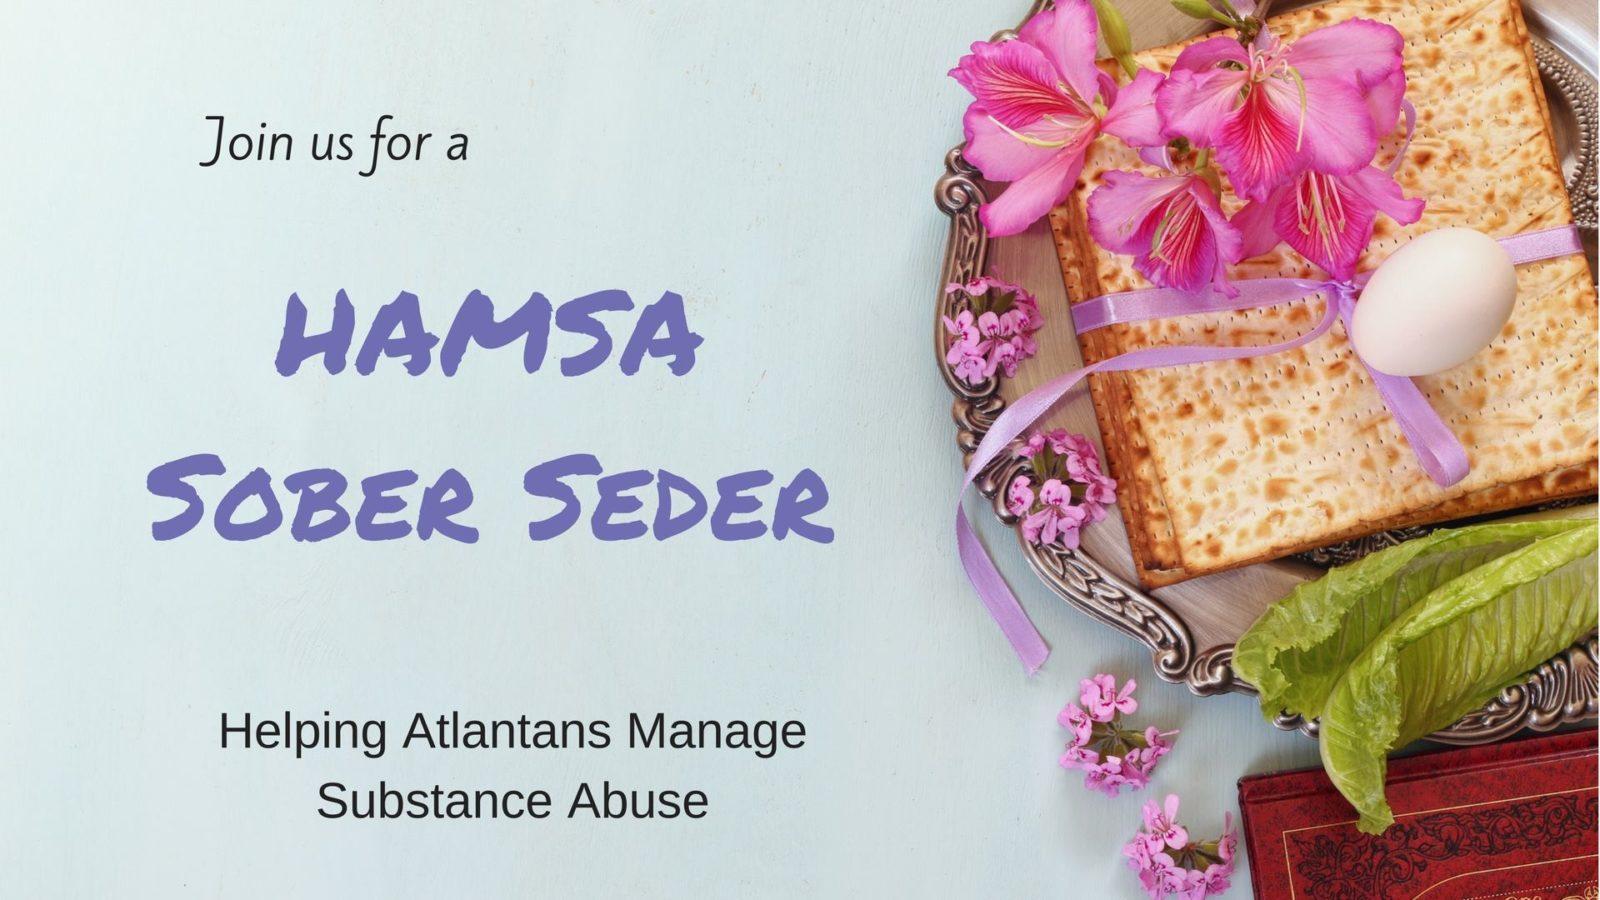 CANCELLED: HAMSA Sober Seder